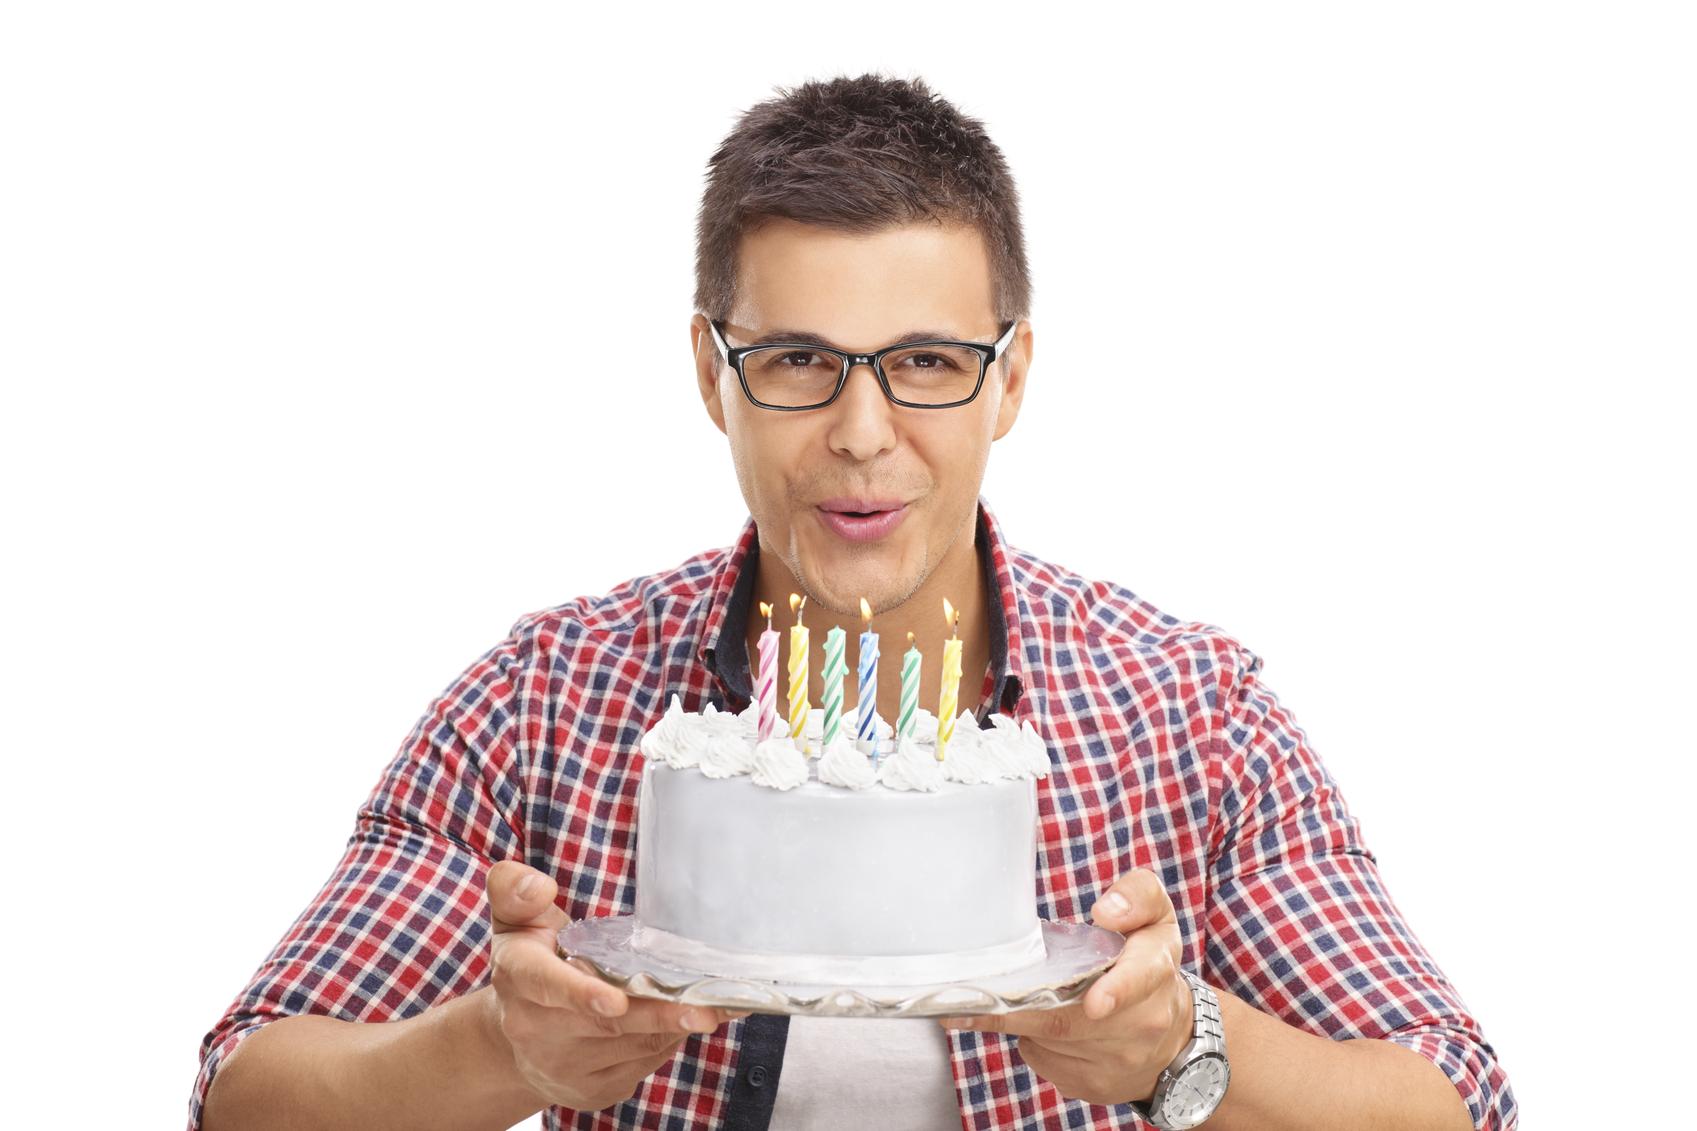 Bachelorbox födelsedagstipsar - hoppas på fler presentinköp